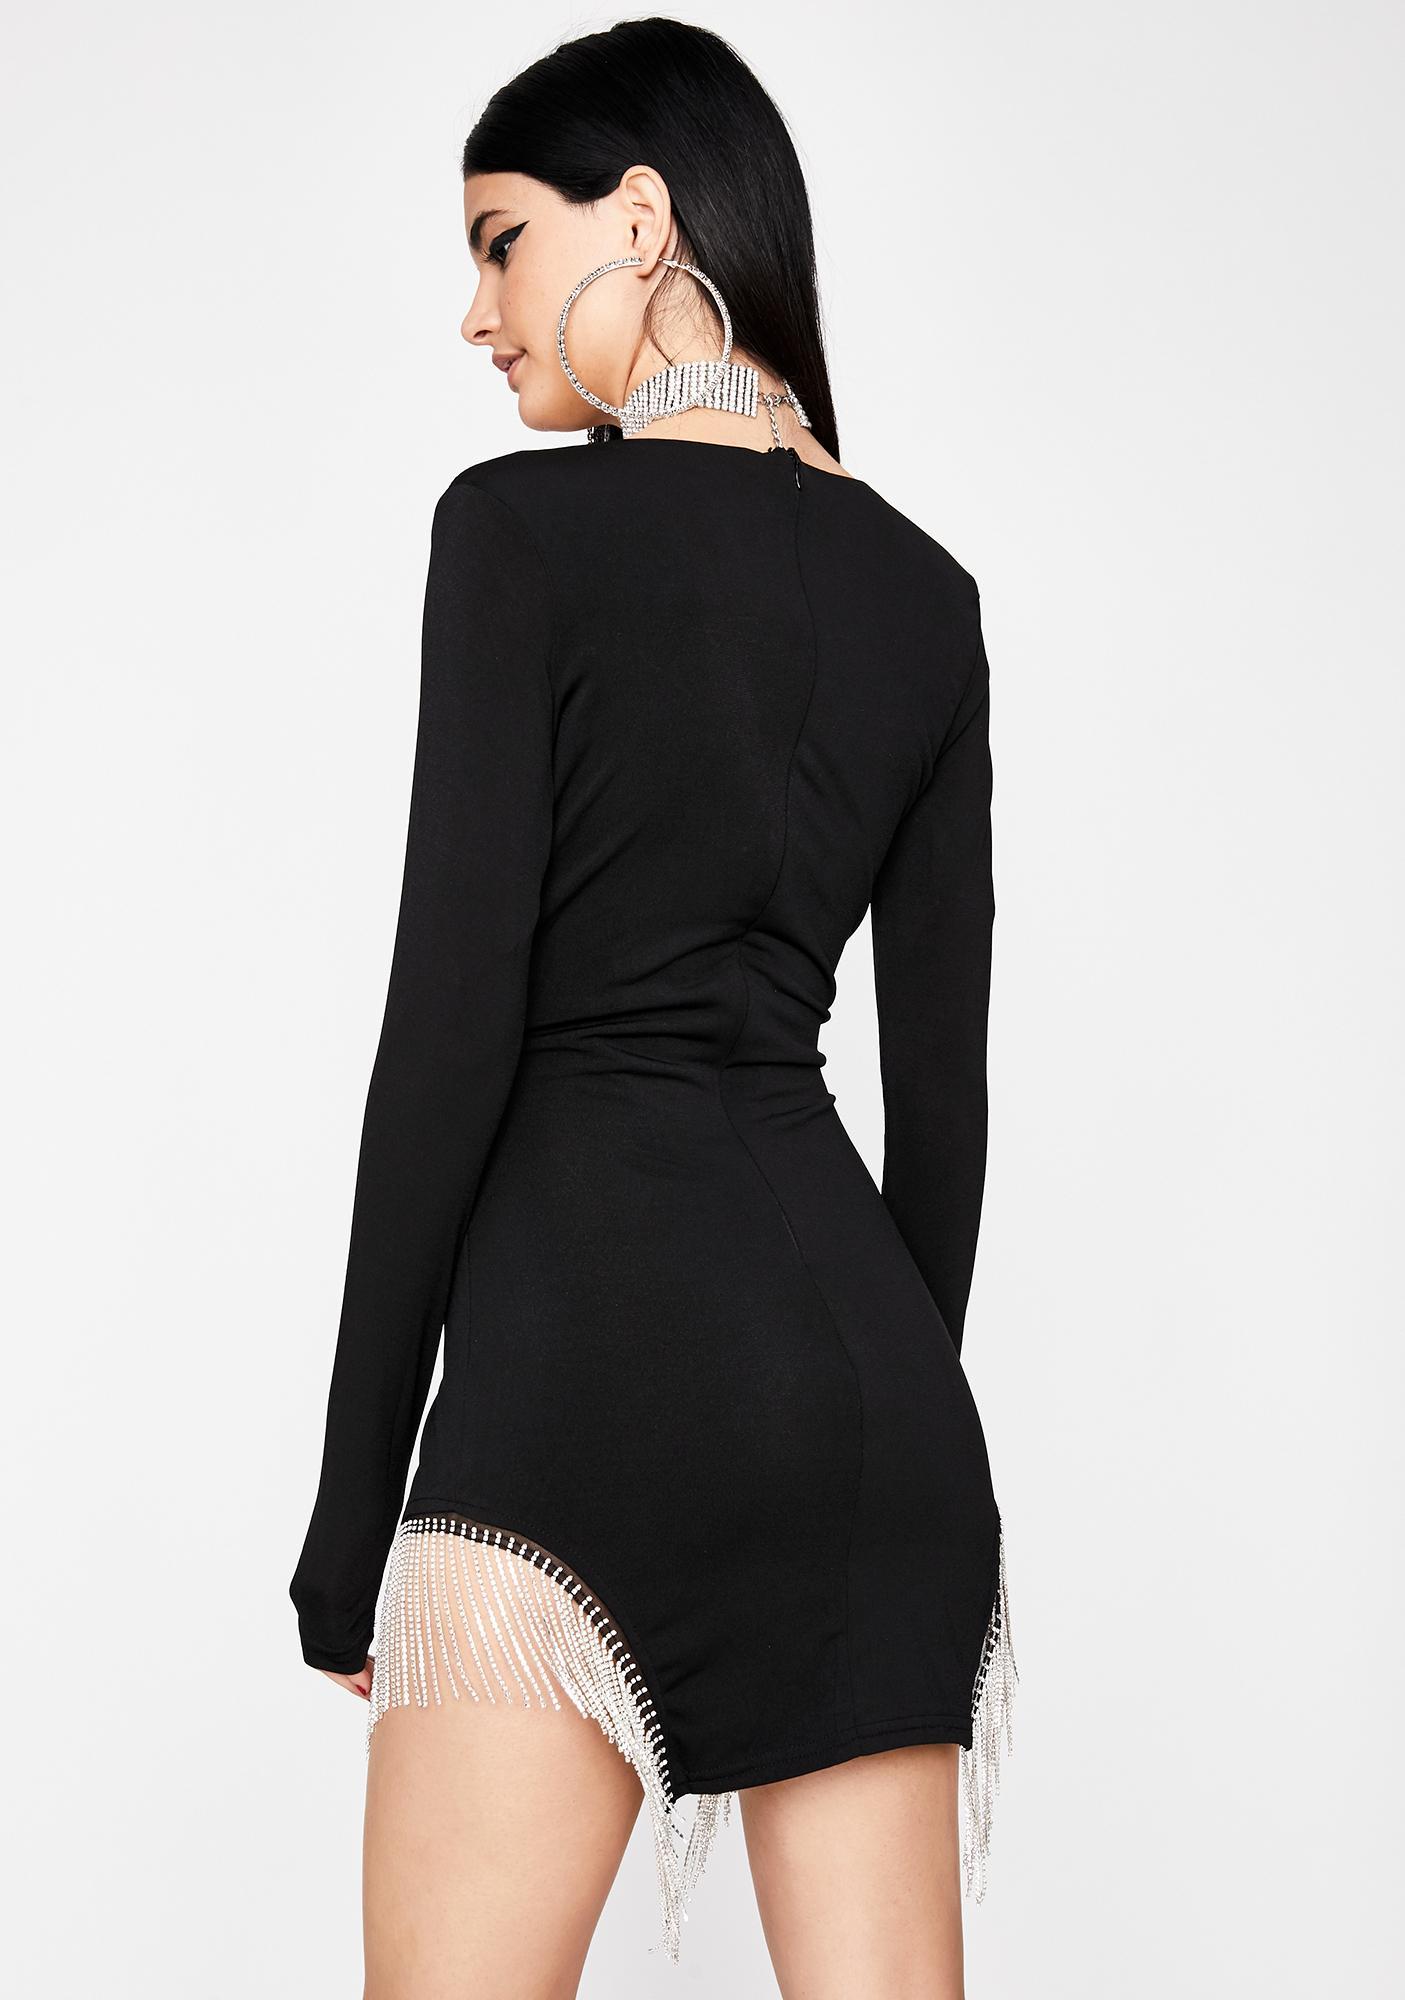 Dime Piece Fringe Dress